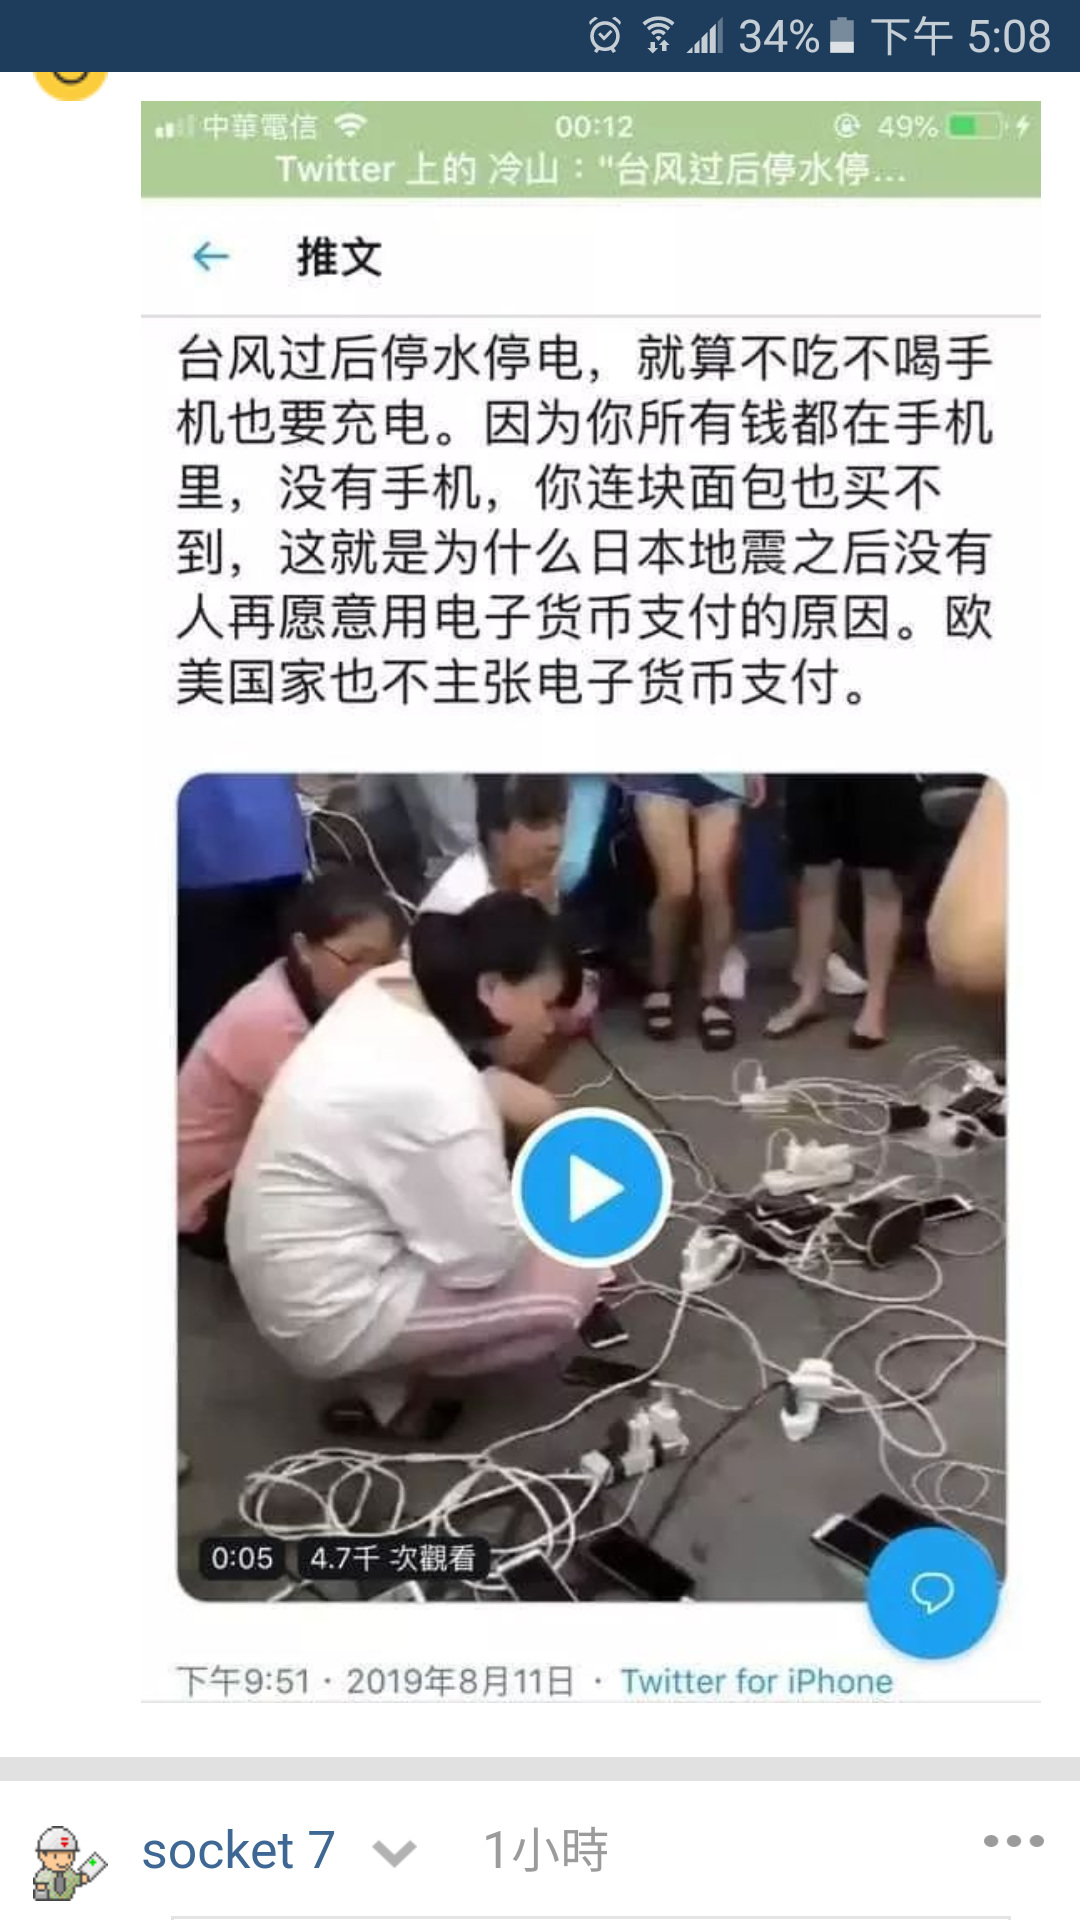 https://upload.cc/i1/2019/08/12/ONLGjS.png